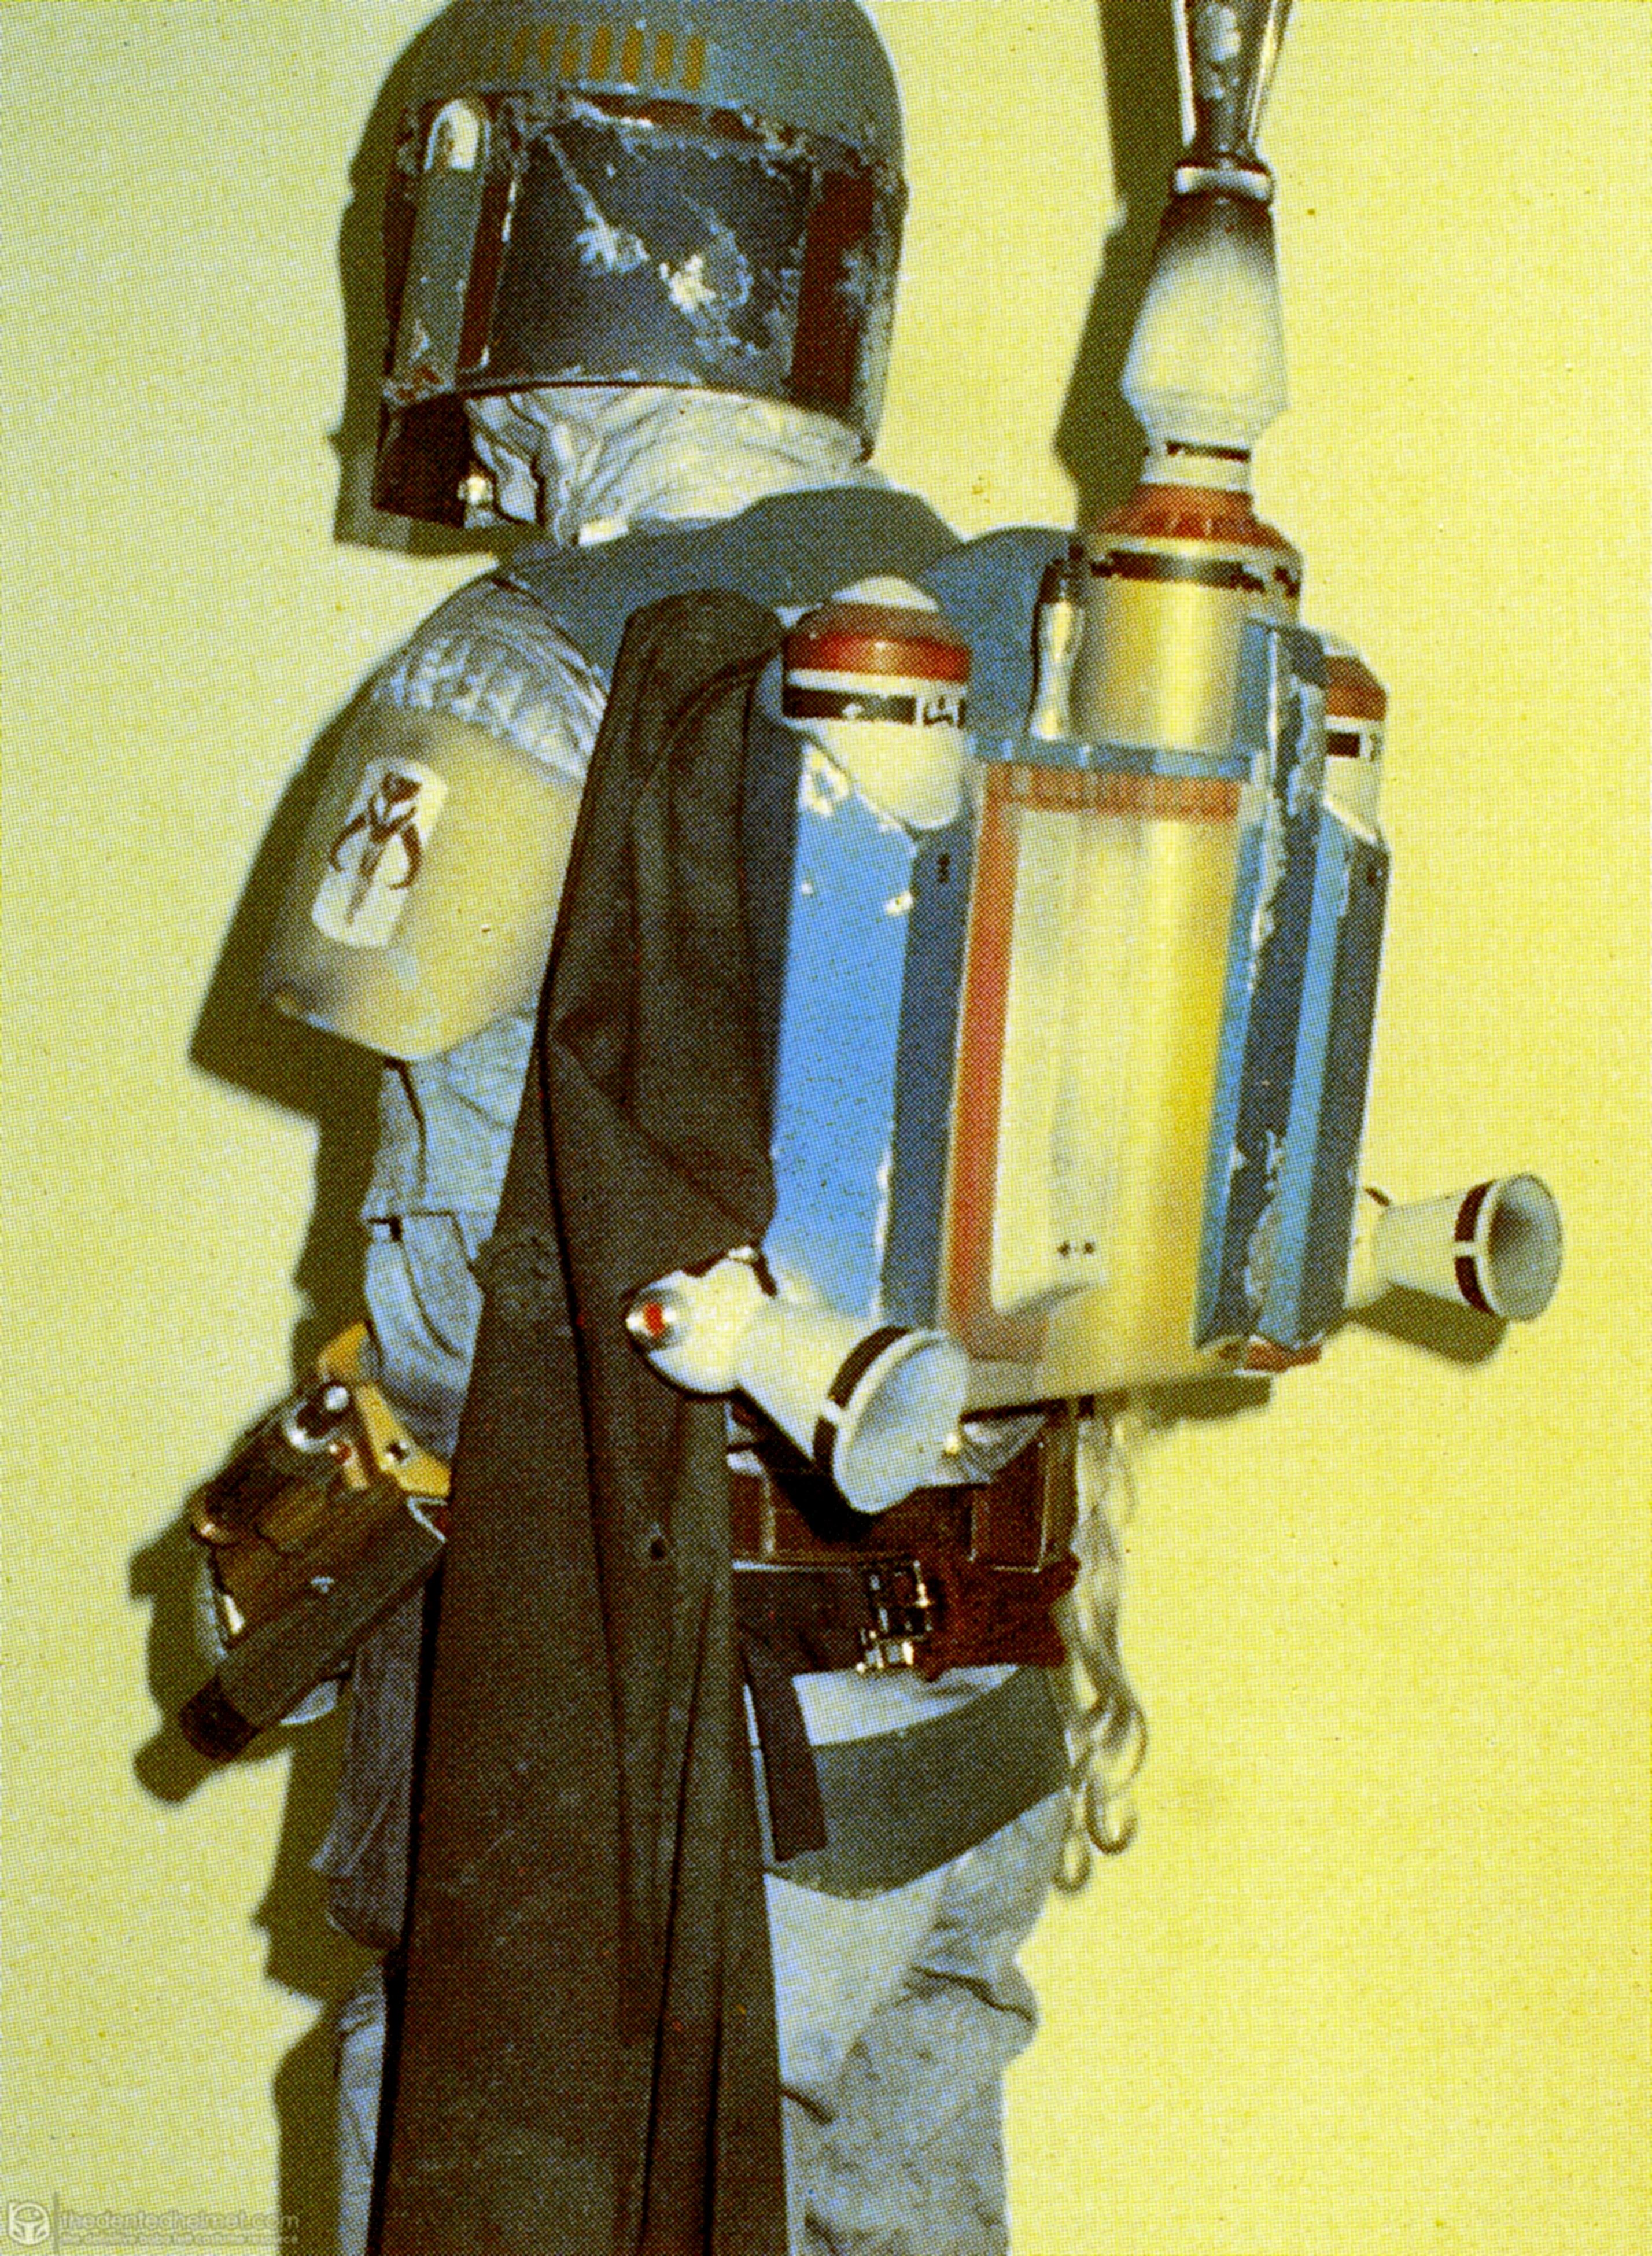 Boba-Fett-Costume-Third-Prototype-06.jpg